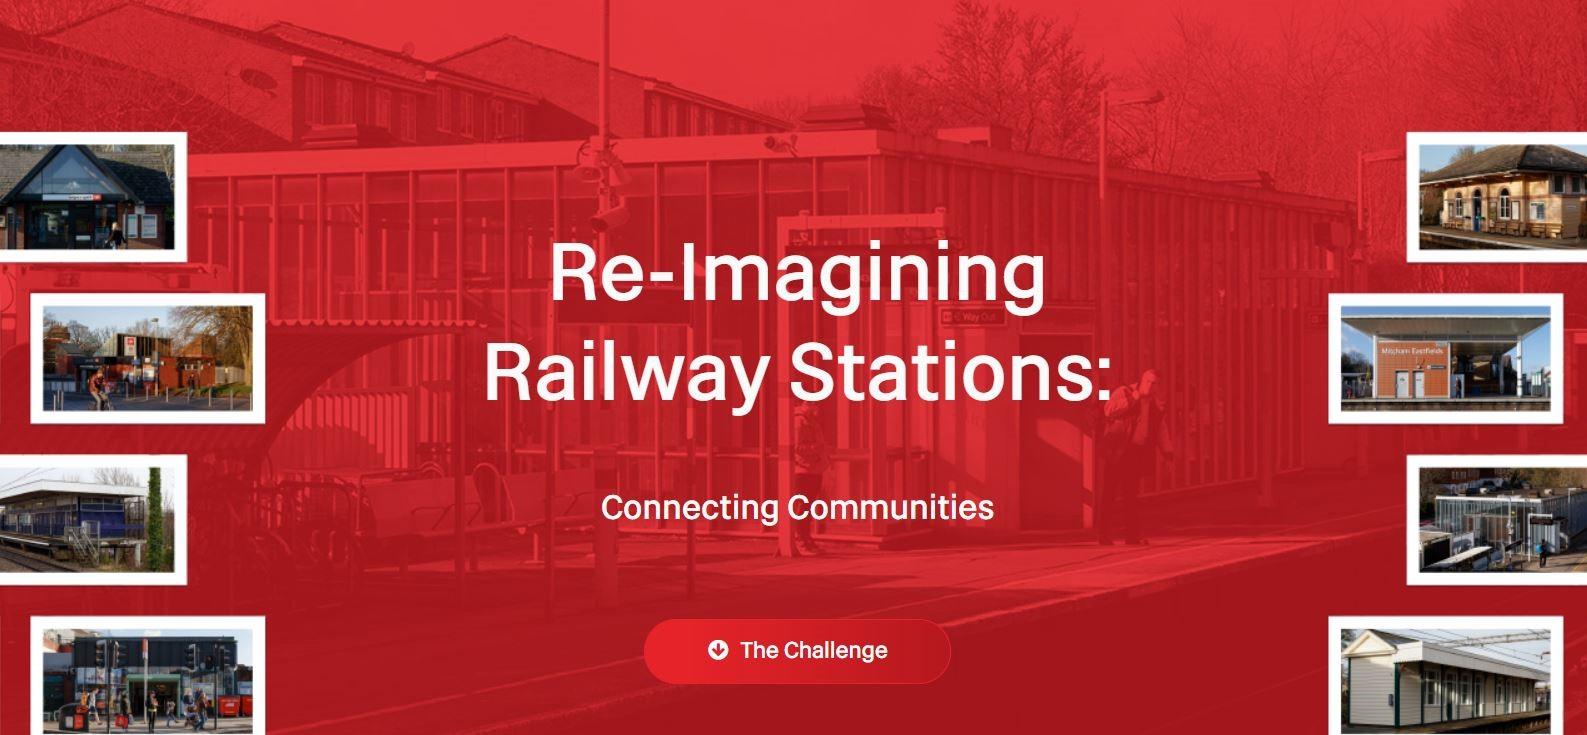 BPR Architects | Network Rails New Heartbeat